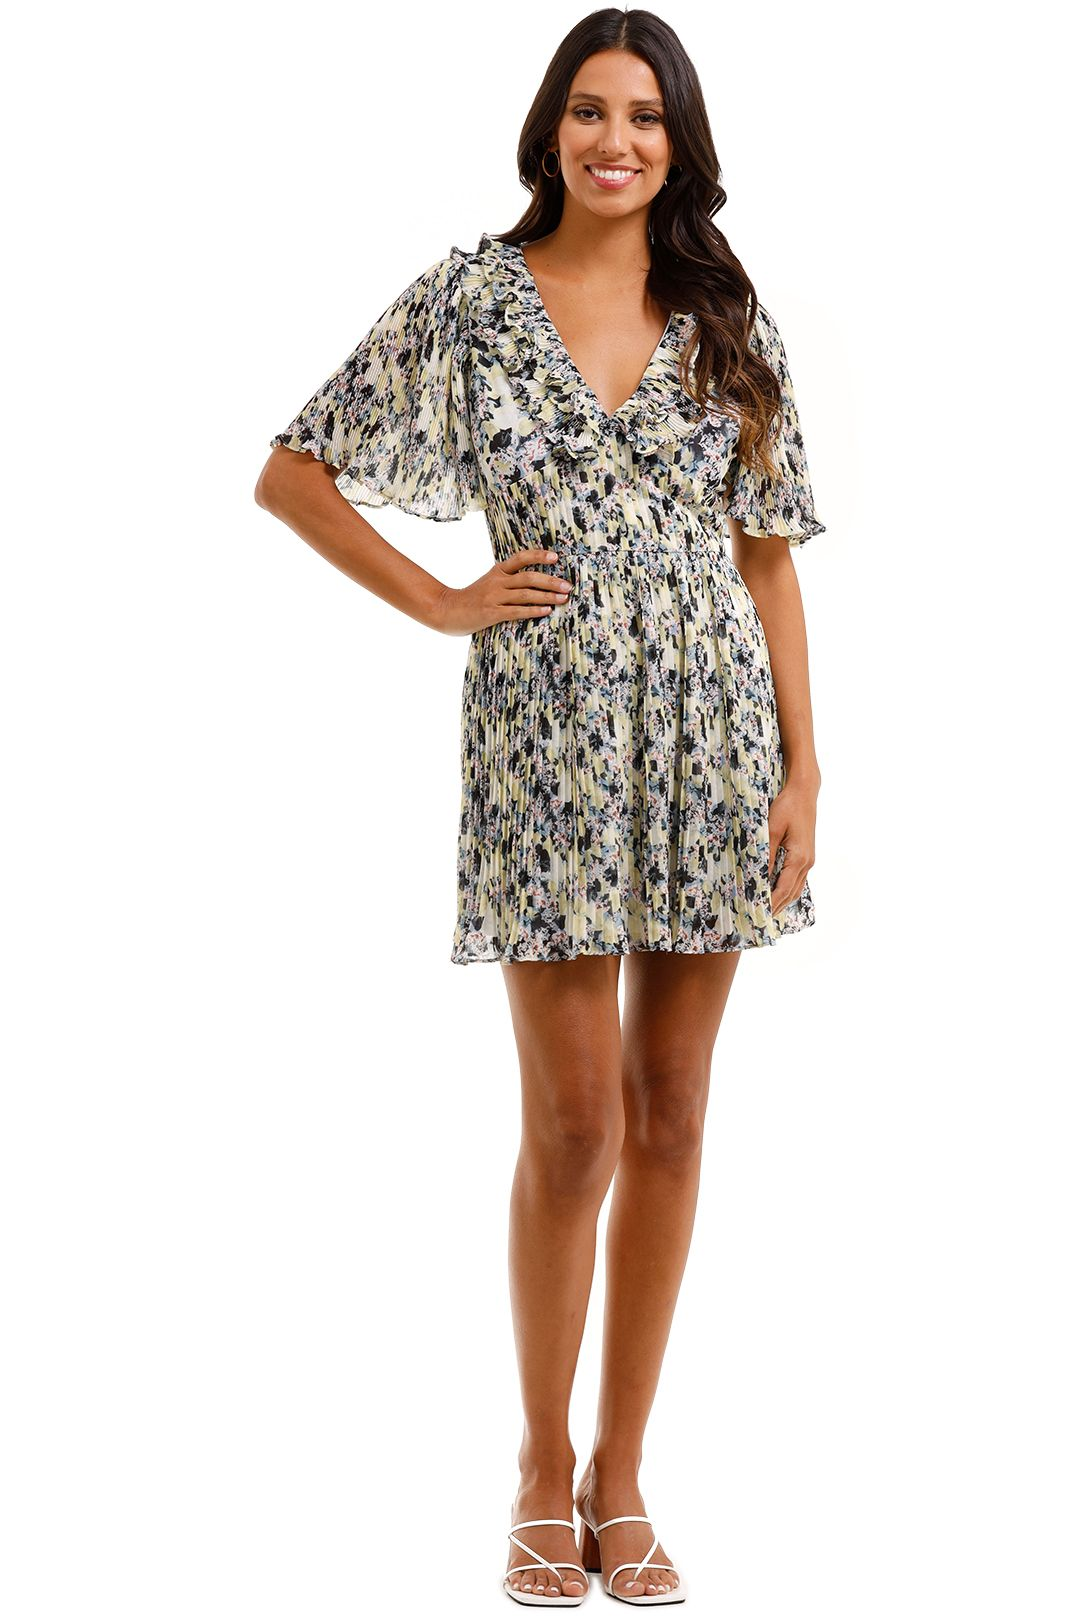 Talulah Birdette Mini Dress Olympia Floral Pleated Fabric